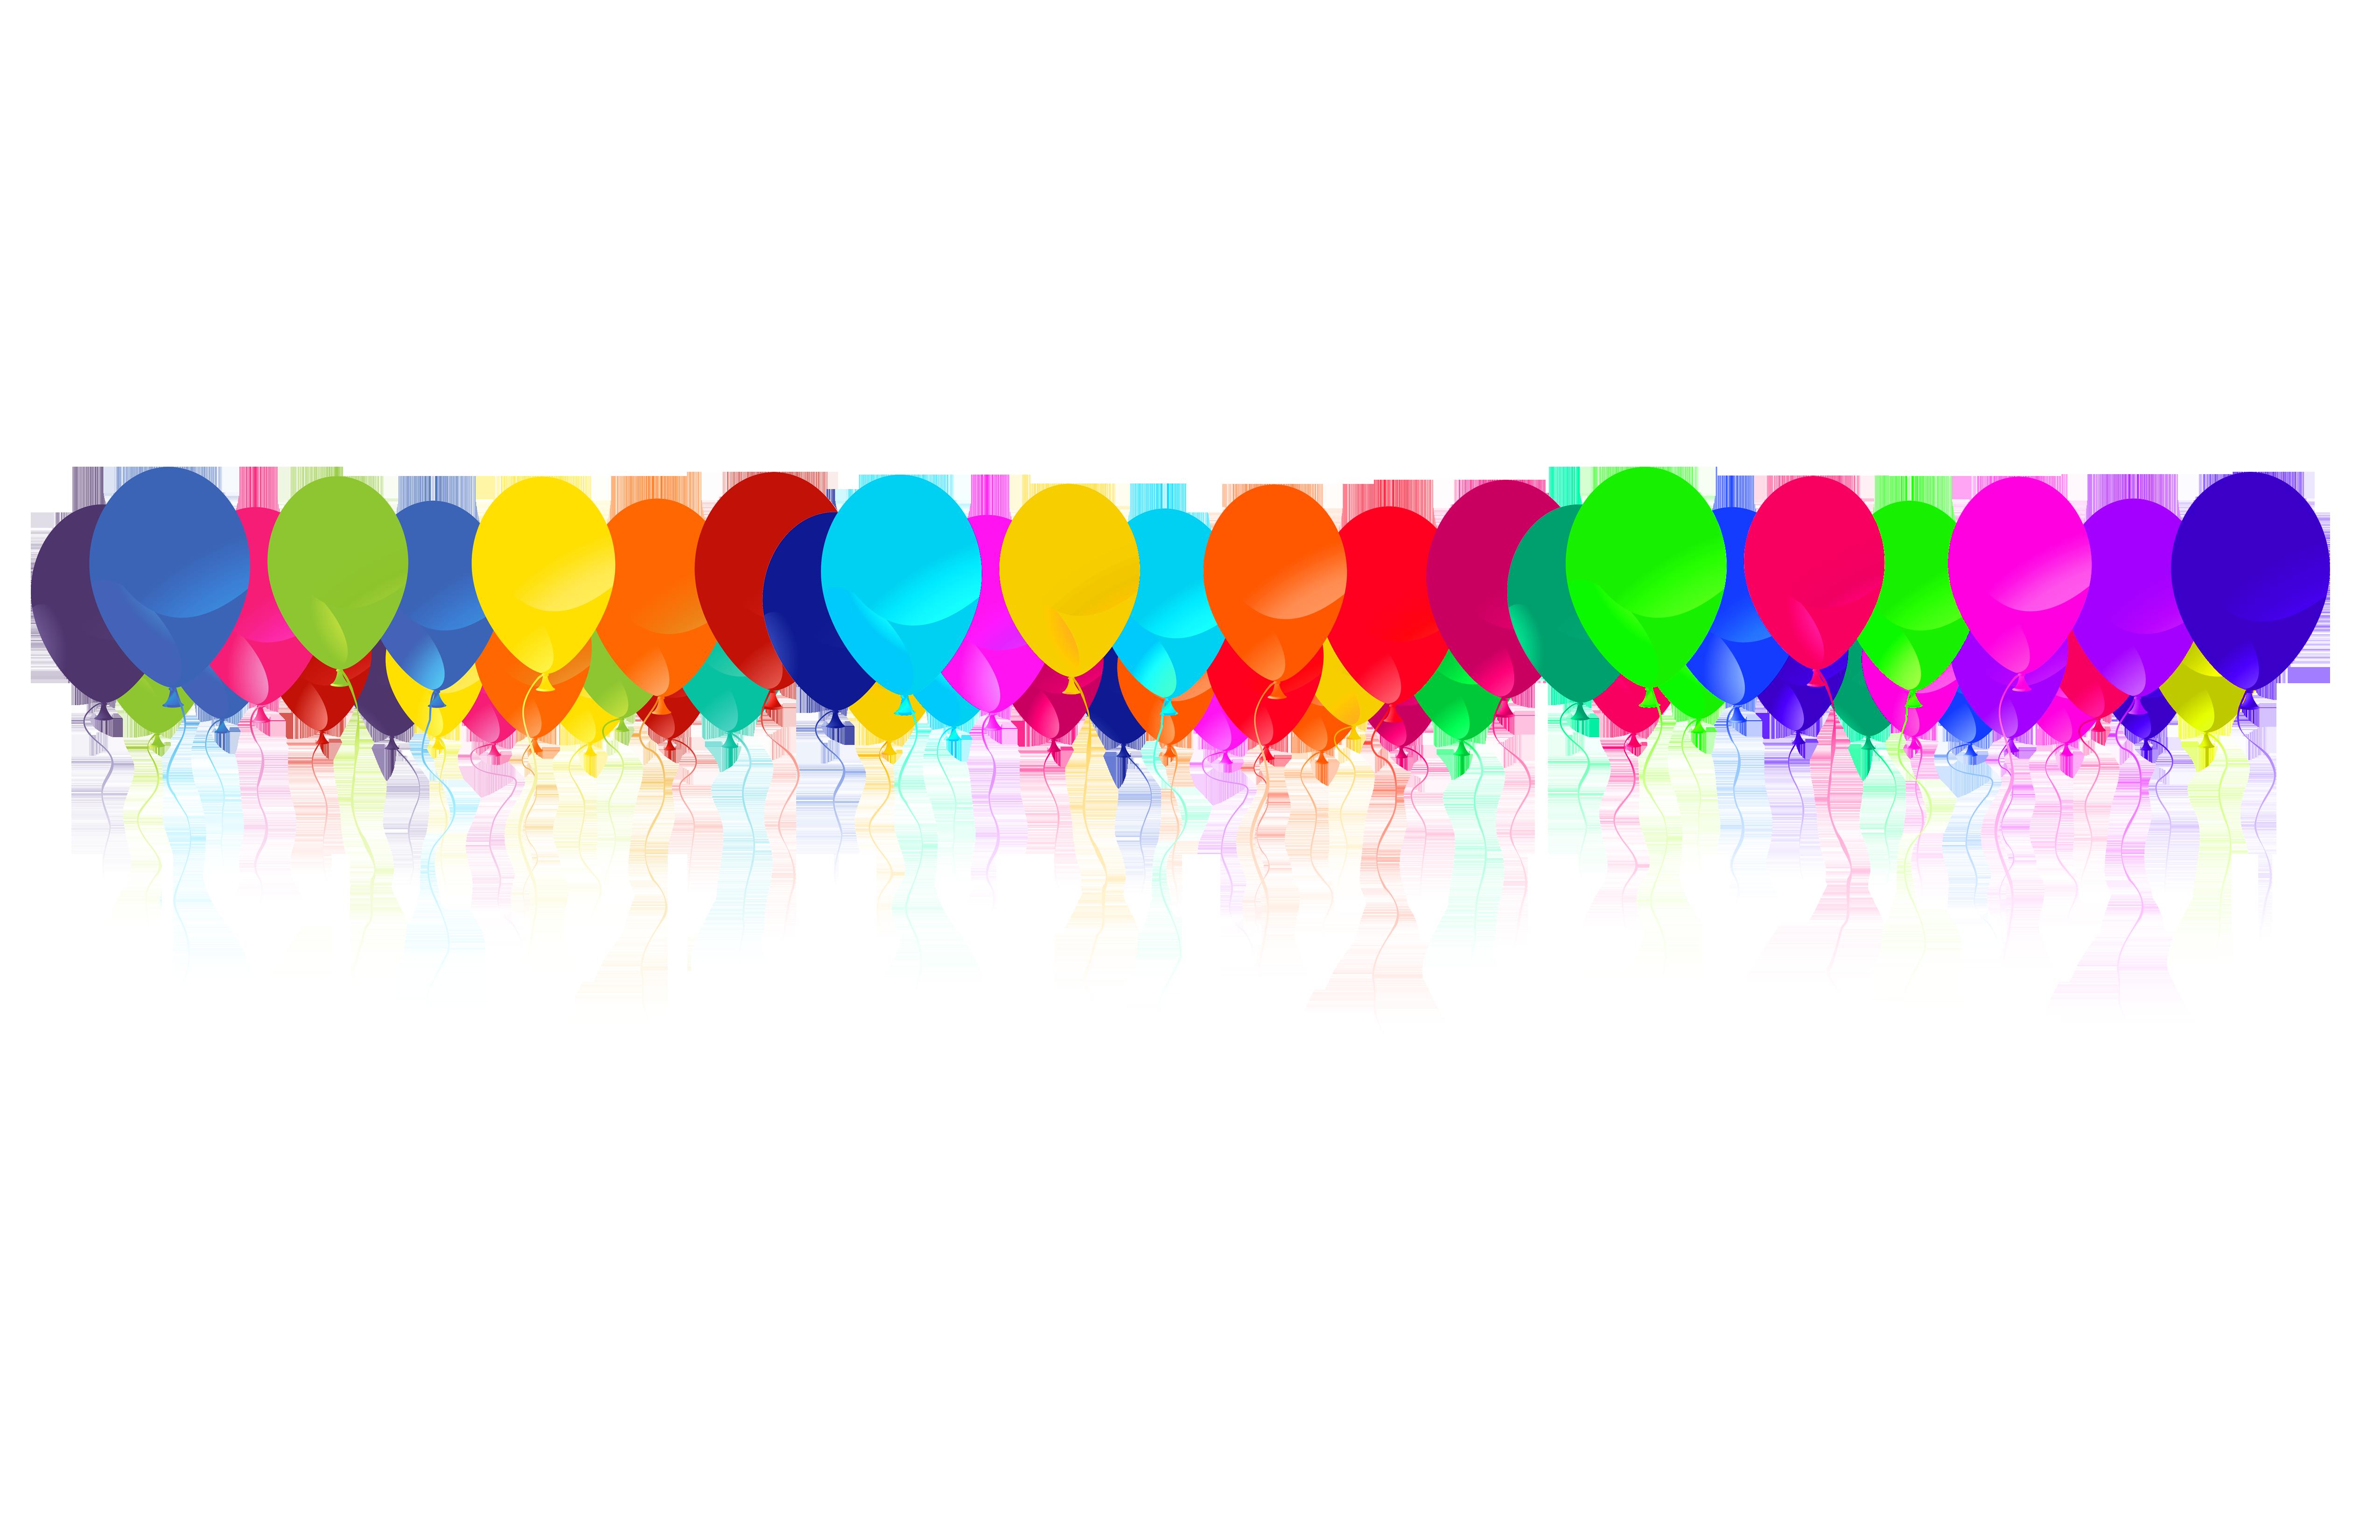 Money horizontal border clipart graphic free free balloon border clip art kikkg64ij - Clip Art. Net graphic free